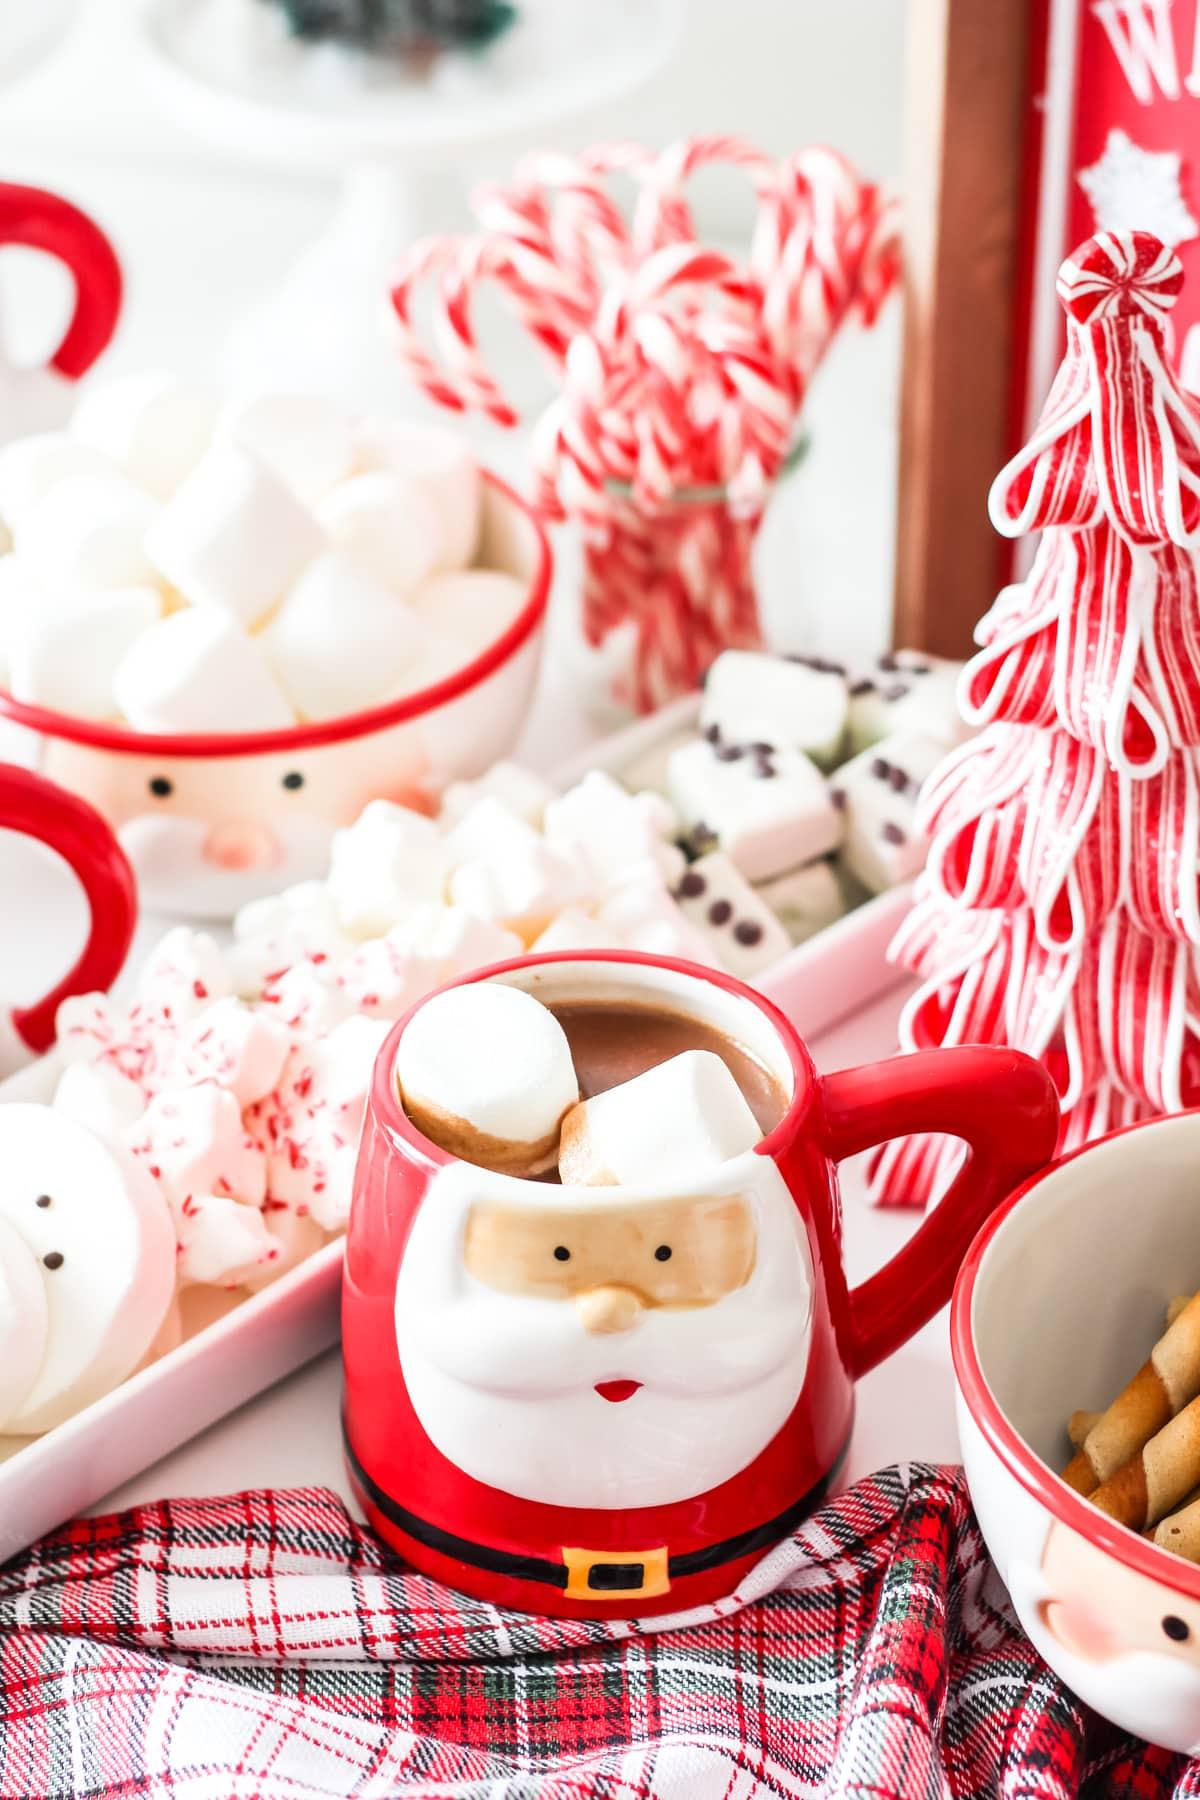 A Santa mug full of hot chocolate and marshmallows sitting on a table of Christmas treats